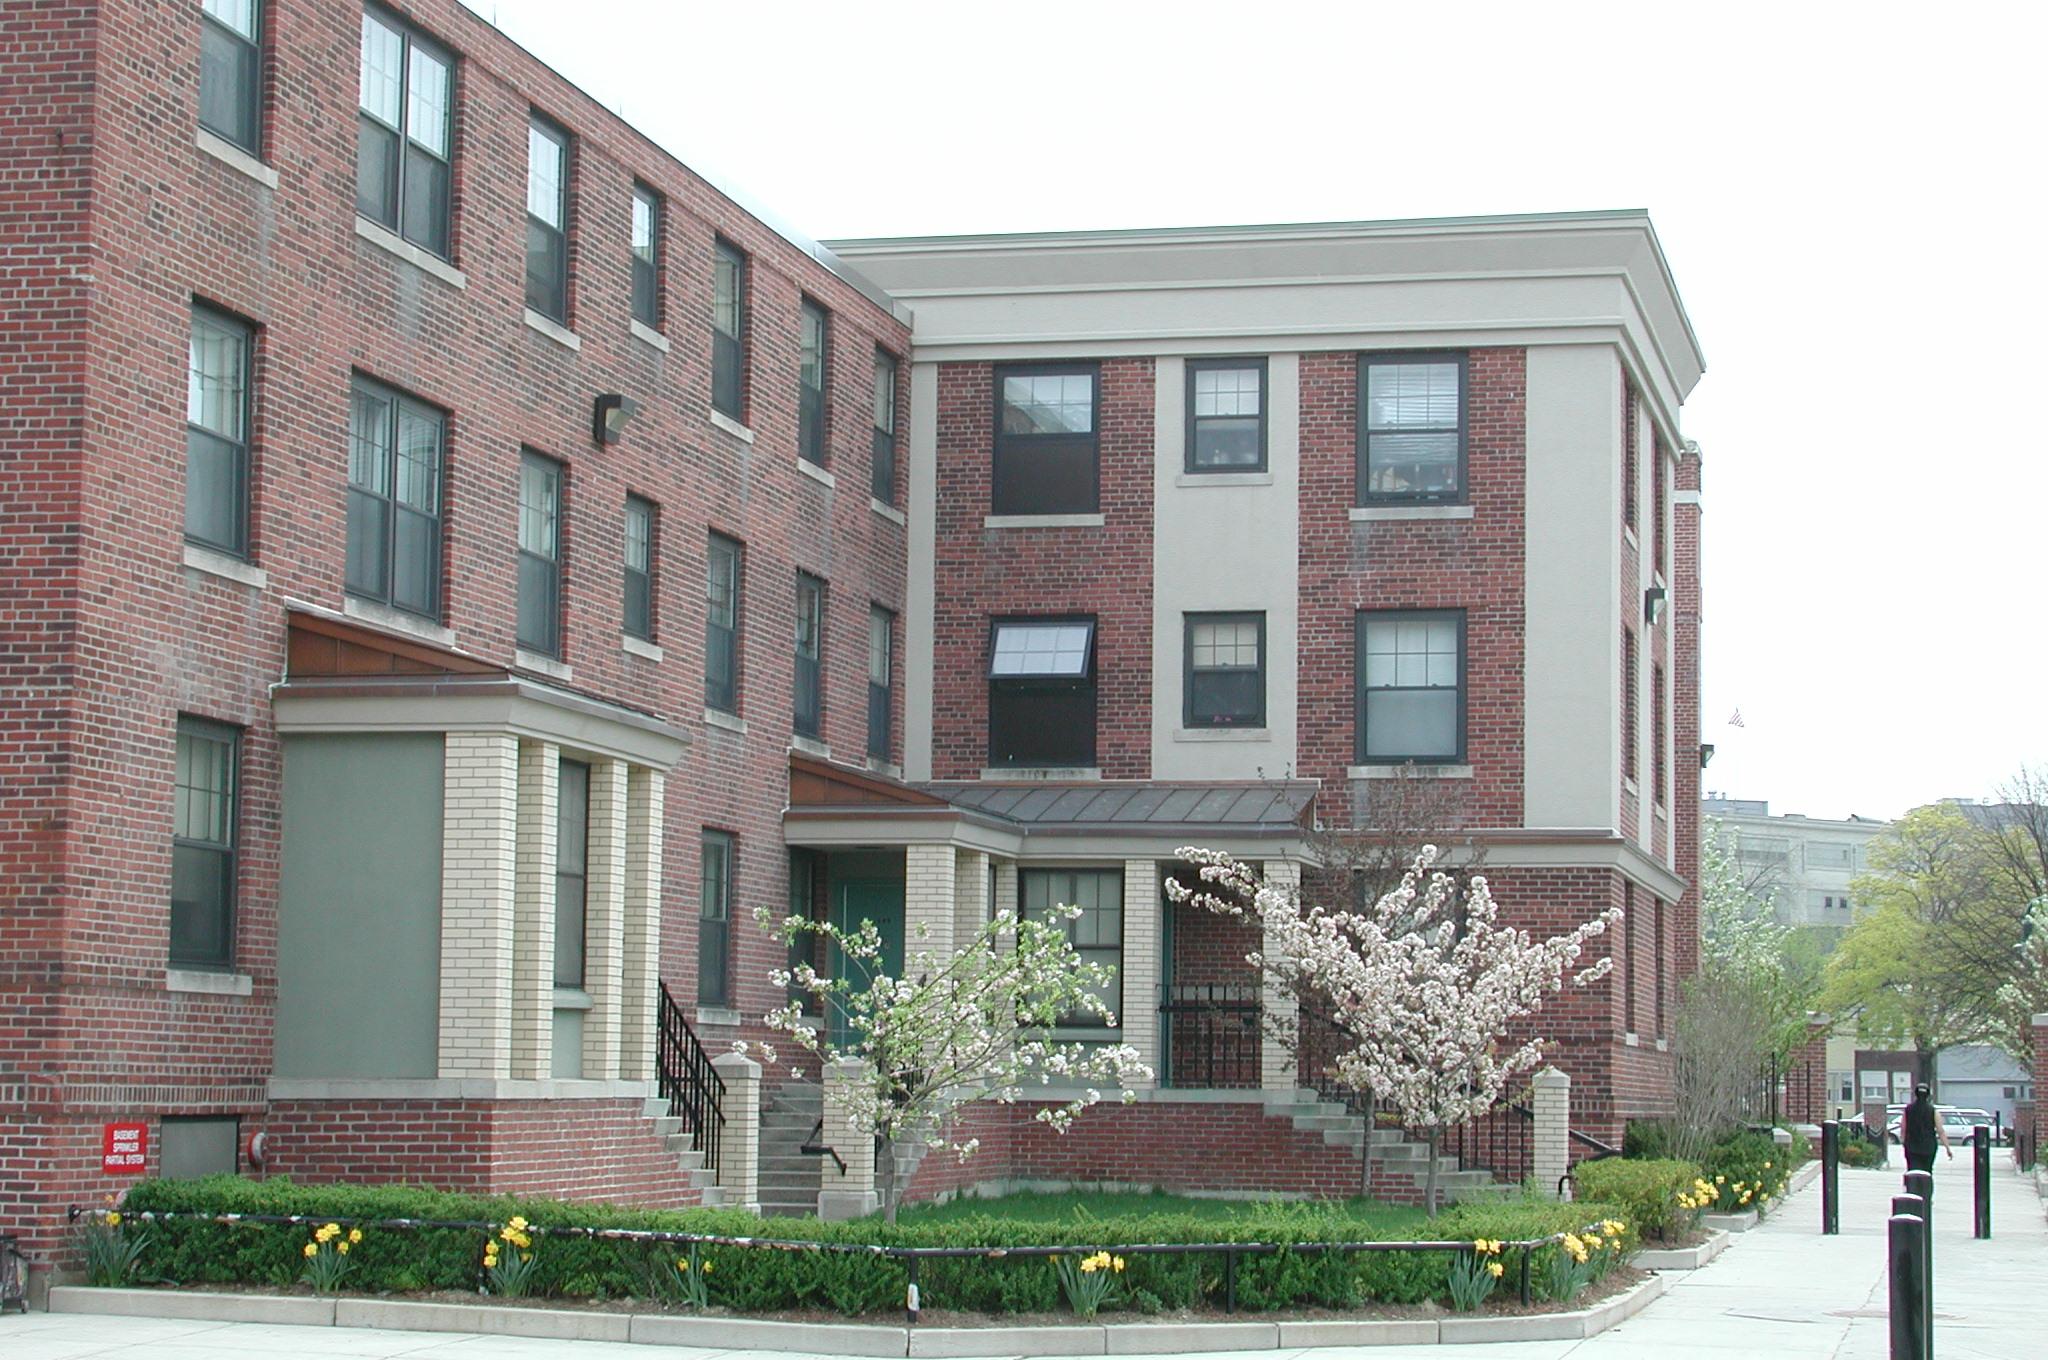 Image of Newtowne Court in Cambridge, Massachusetts